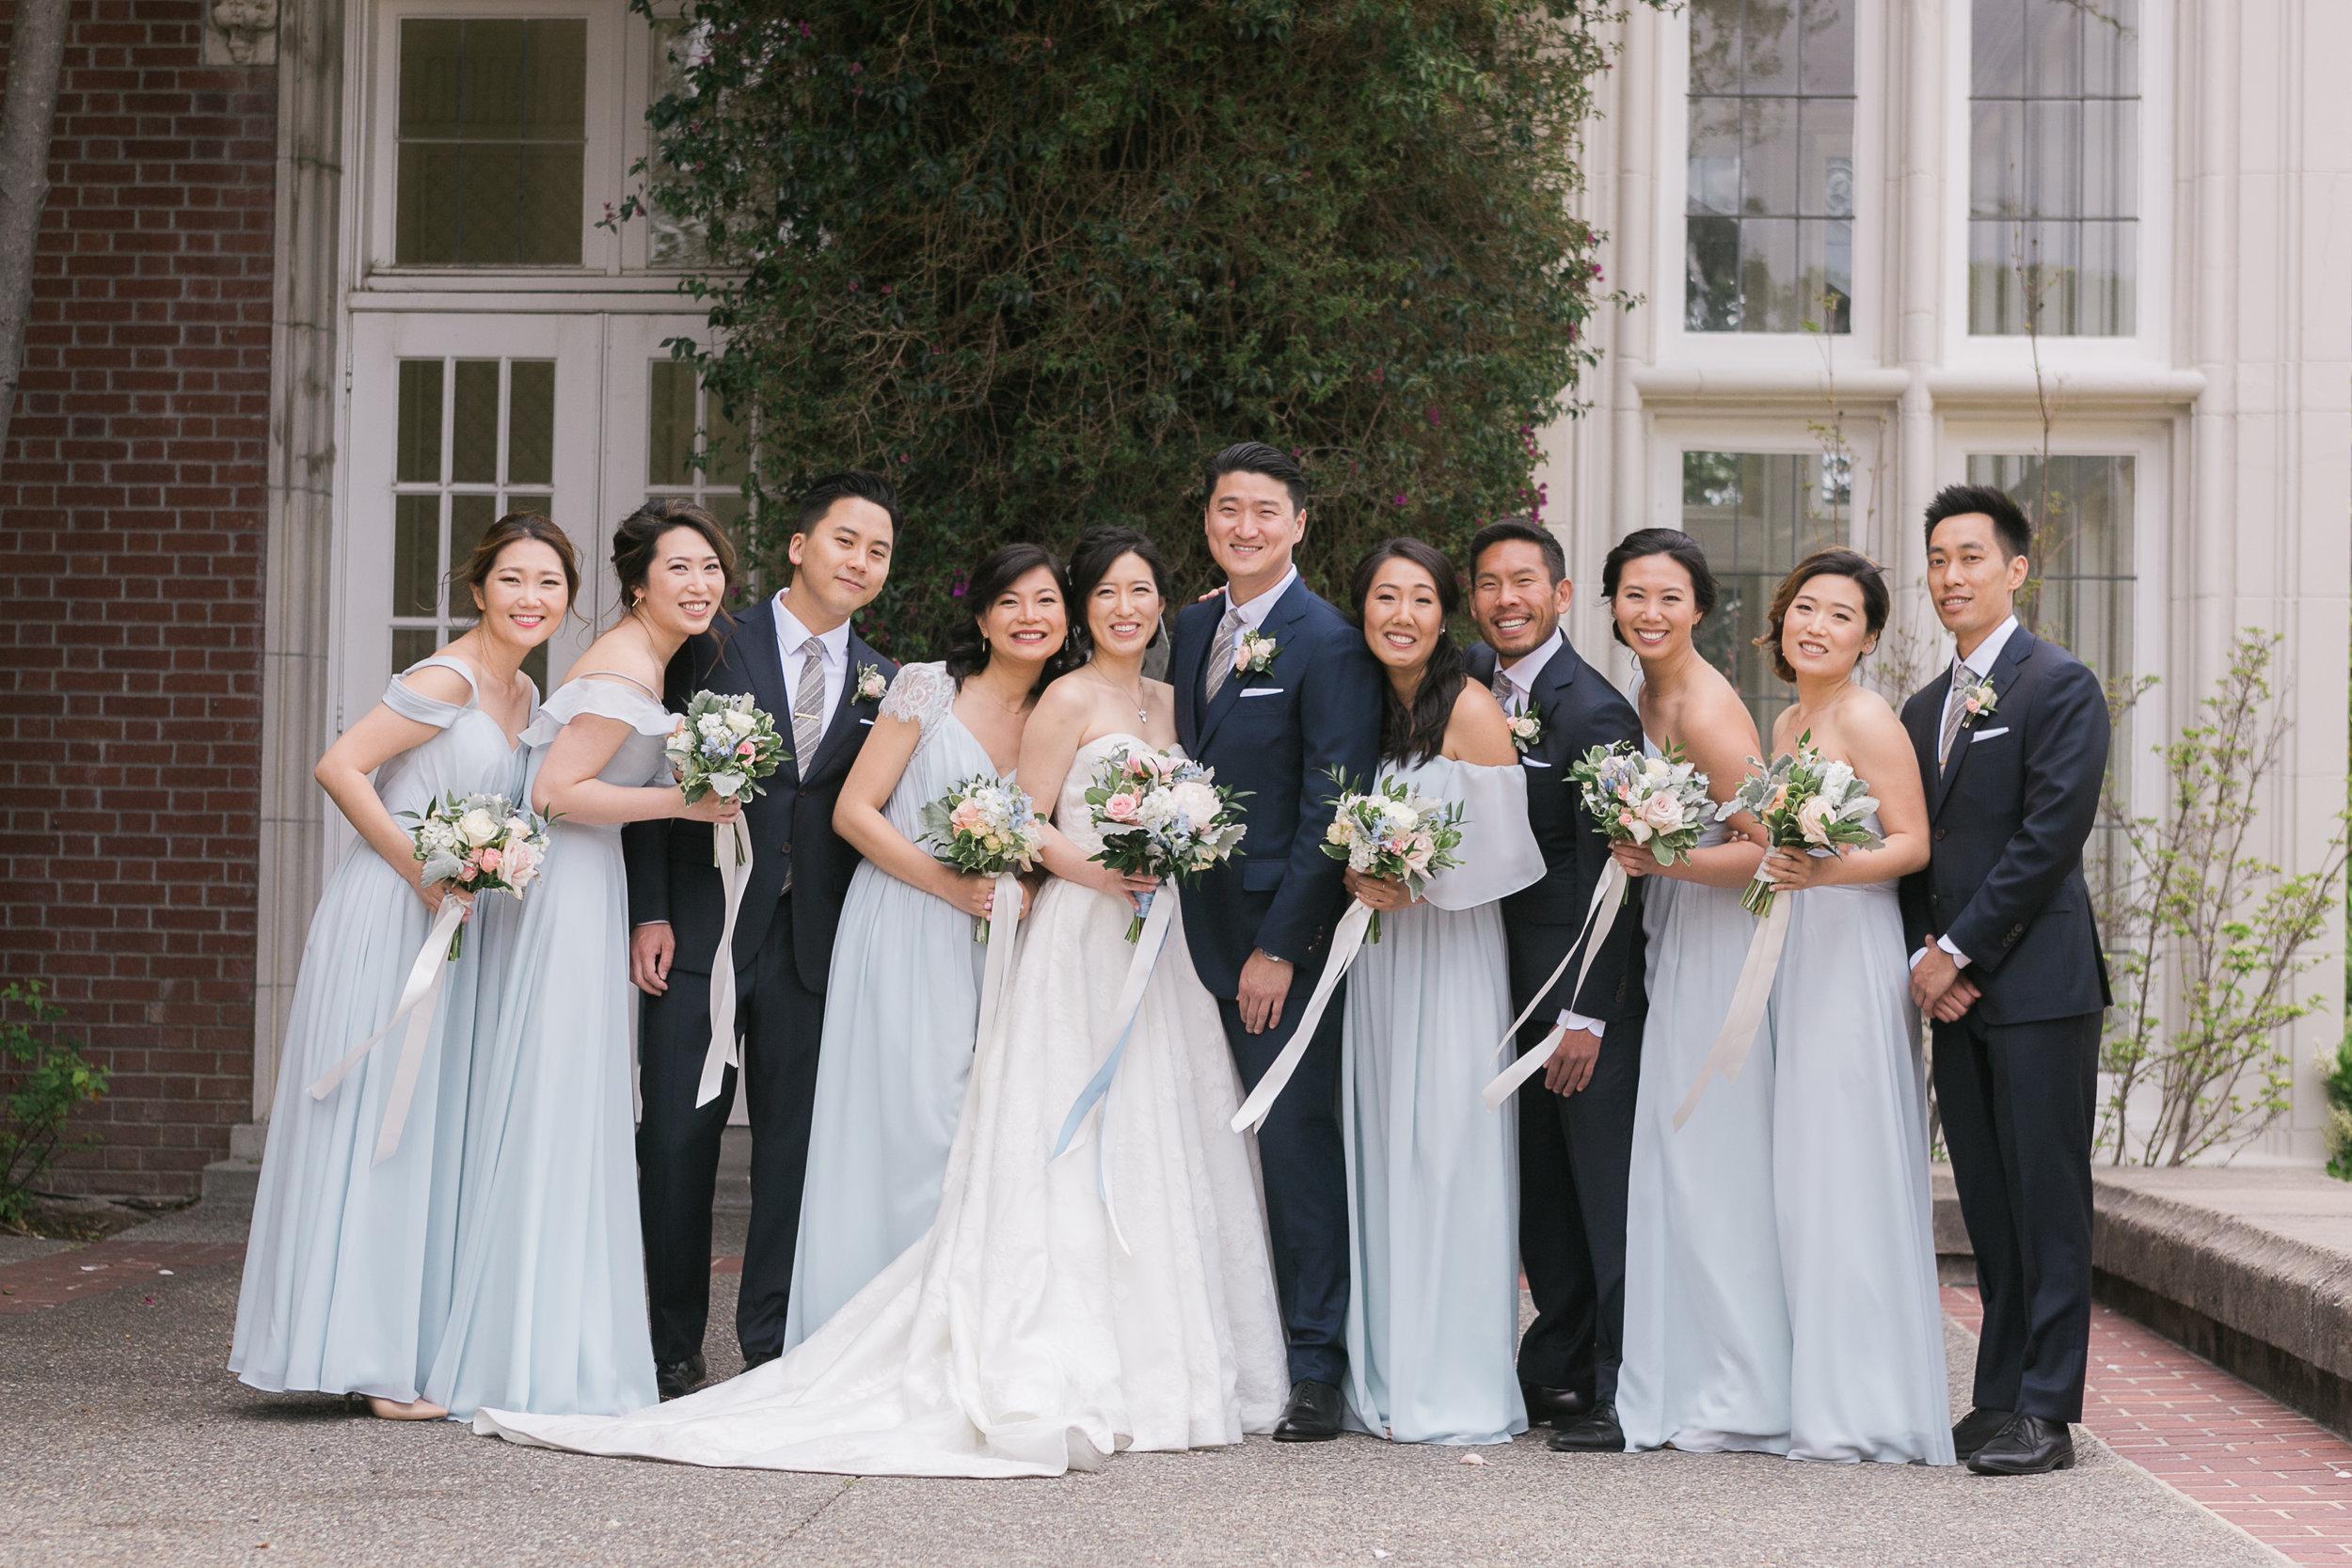 Kohl_Mansion_Wedding_011.jpg